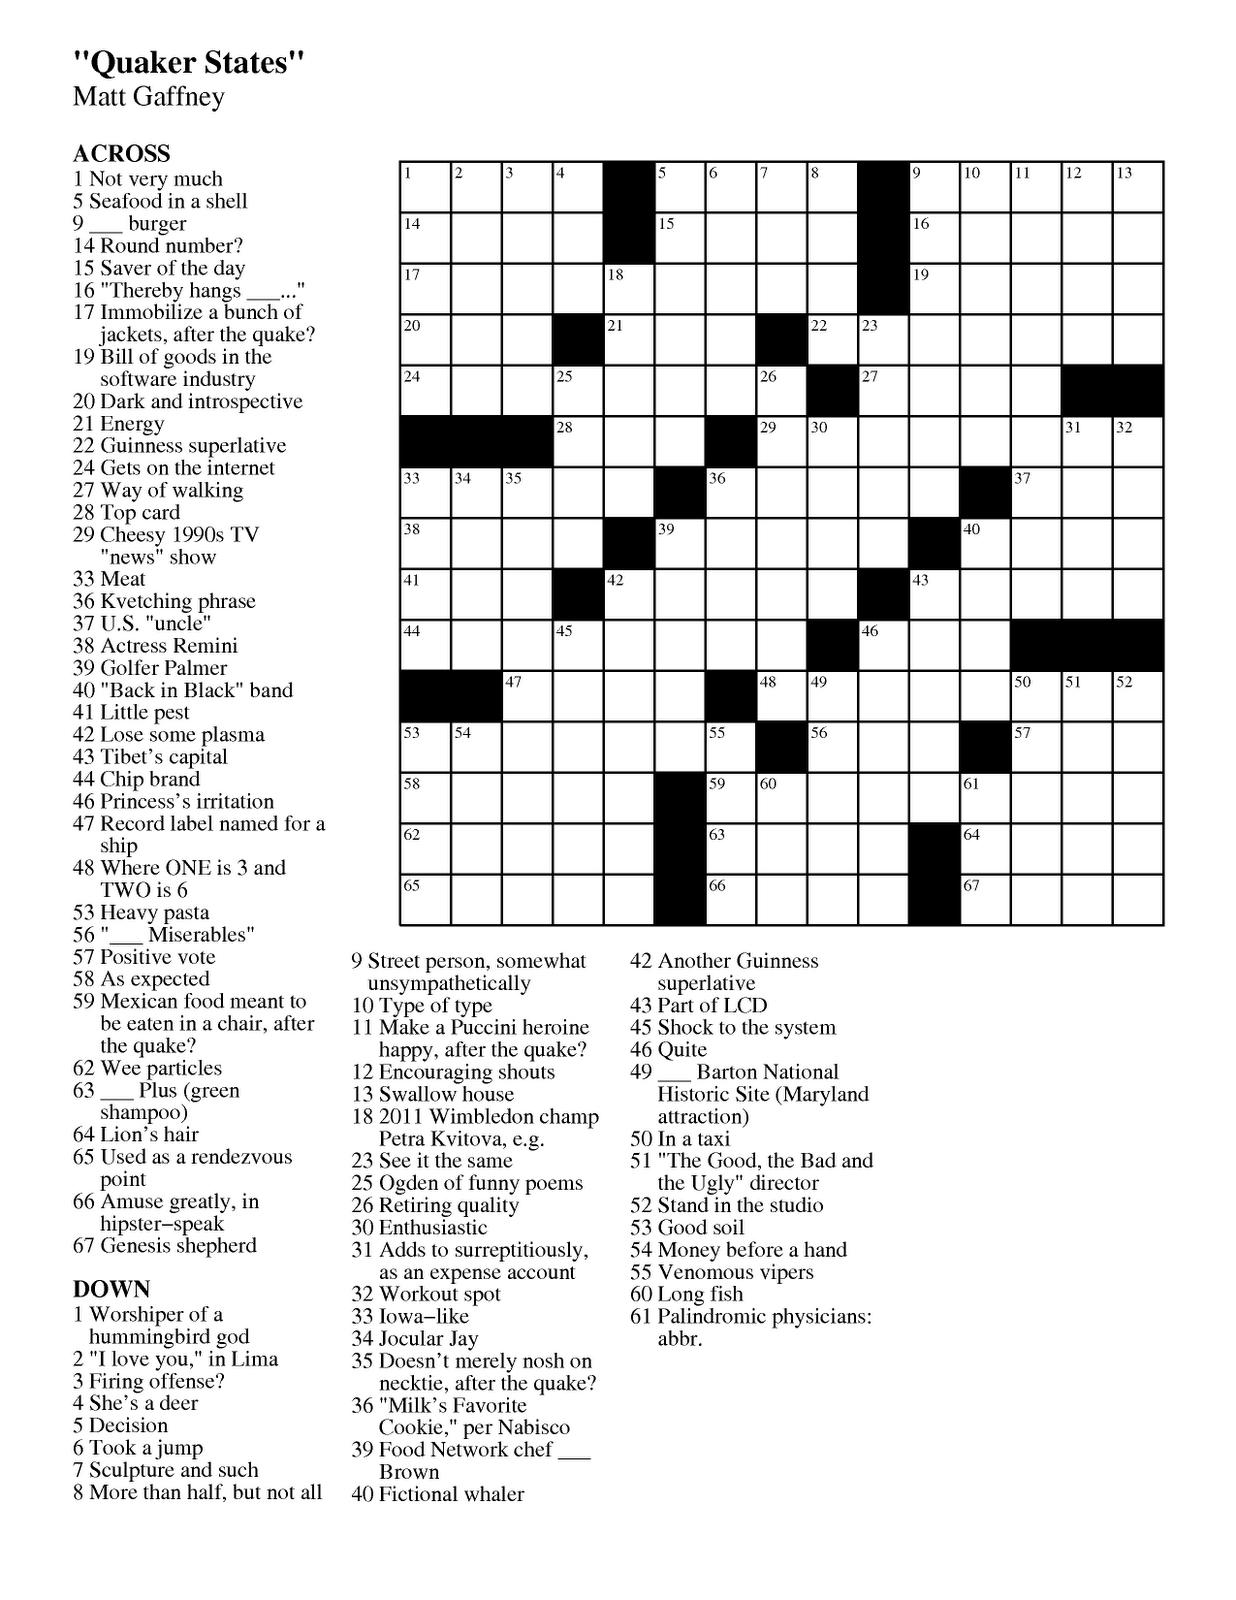 Matt Gaffney's Weekly Crossword Contest: September 2011 - Star Tribune Crossword Puzzle Printable